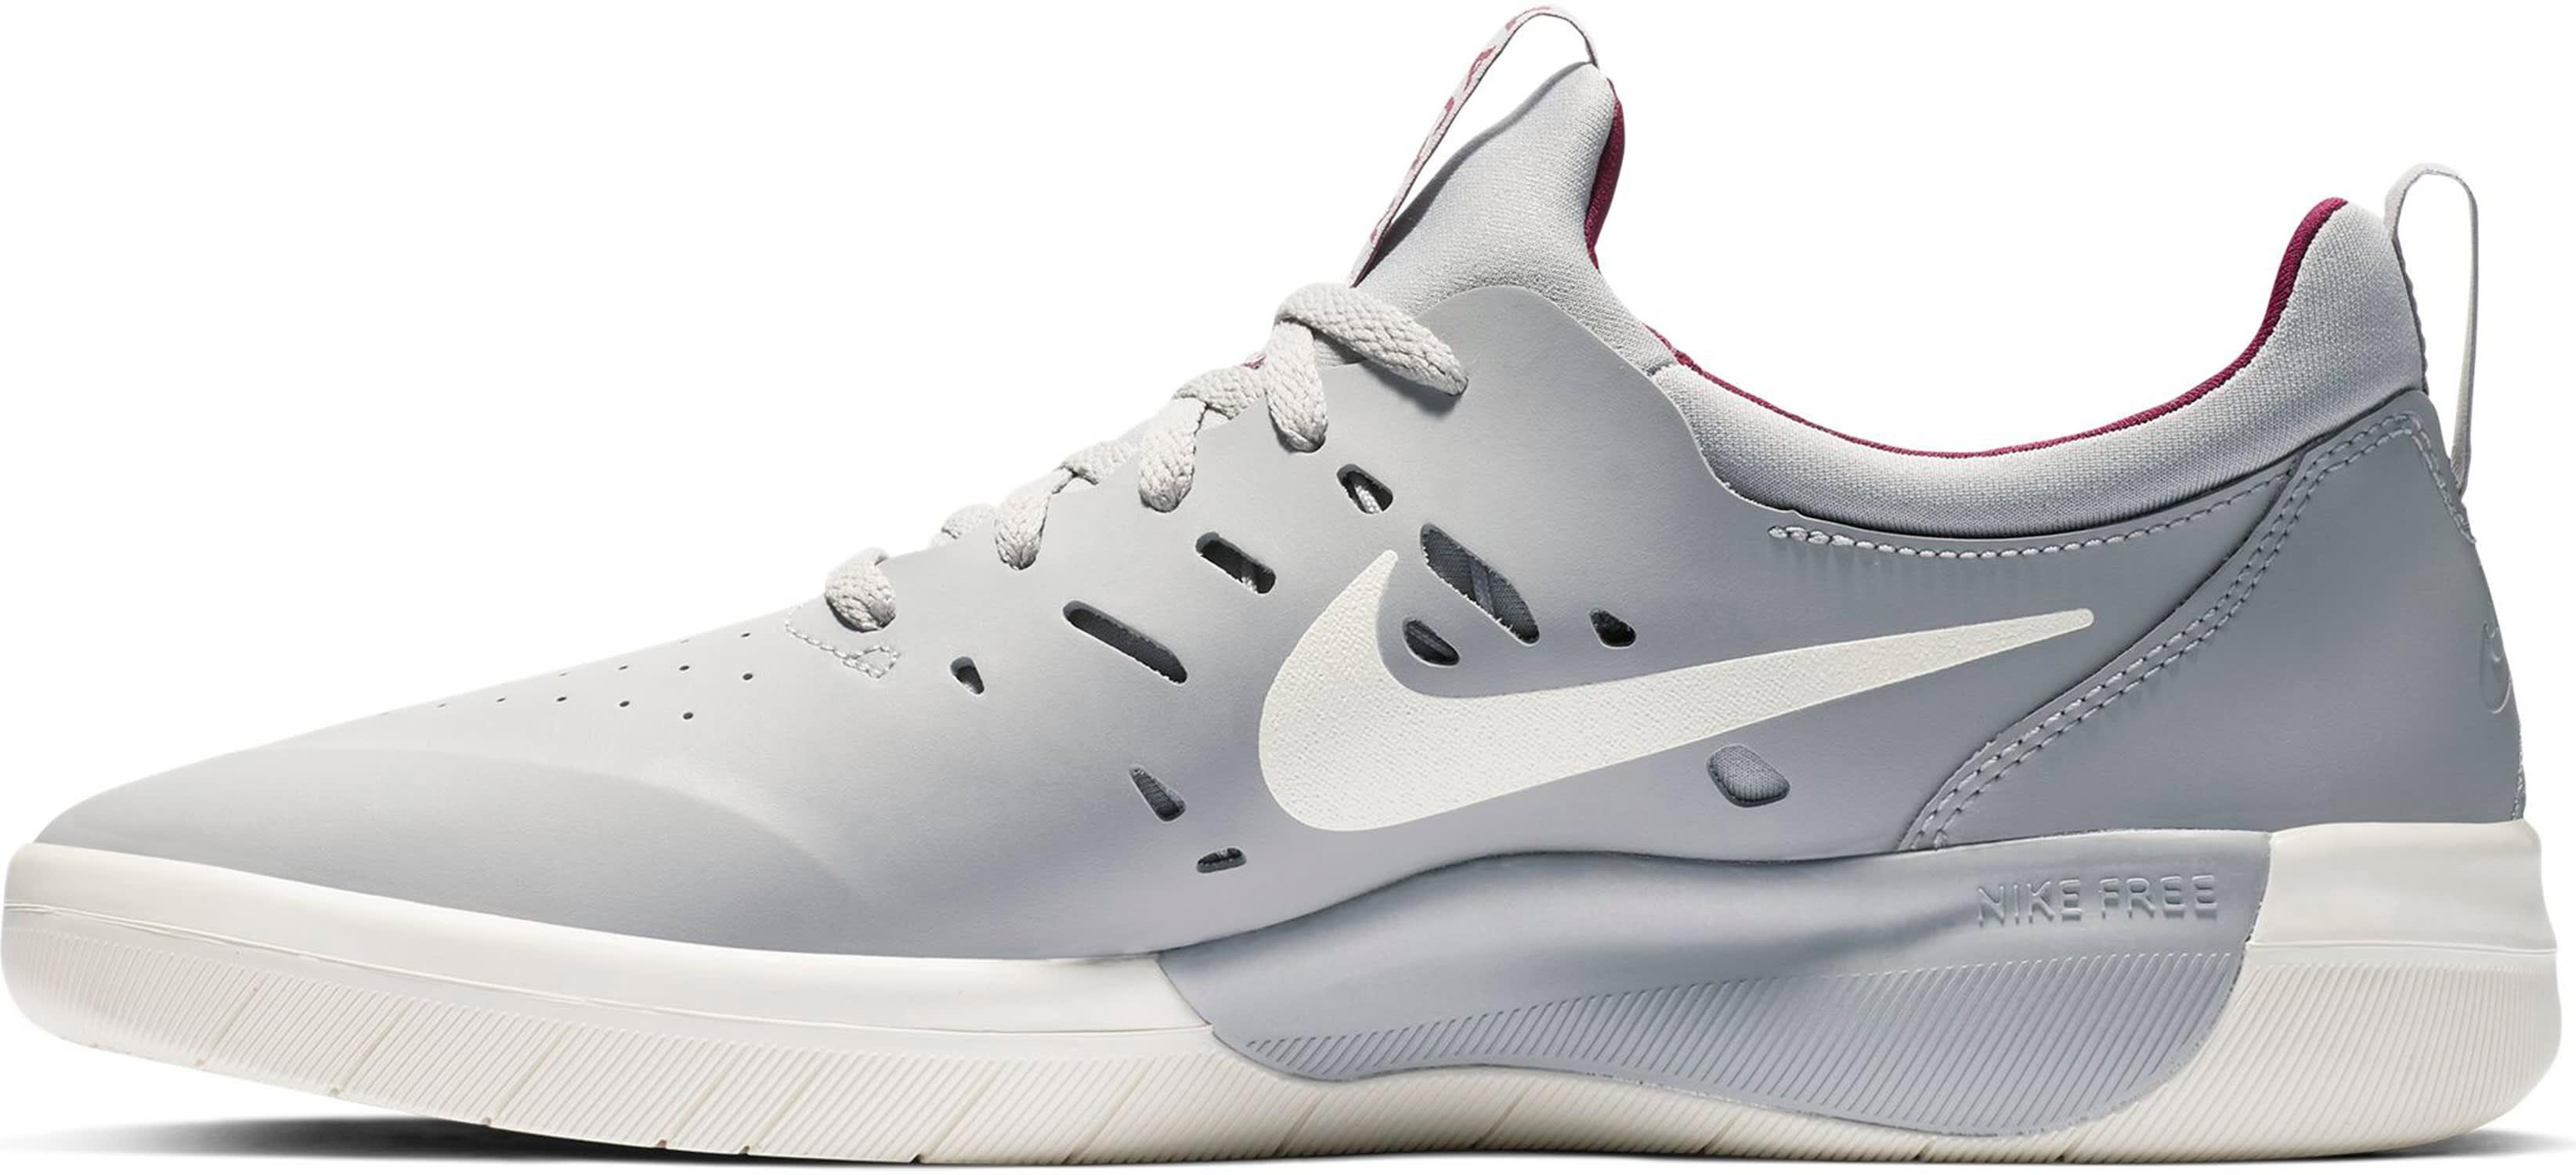 8869984b8067 Nike Nyjah Free Skate Shoes - thumbnail 3